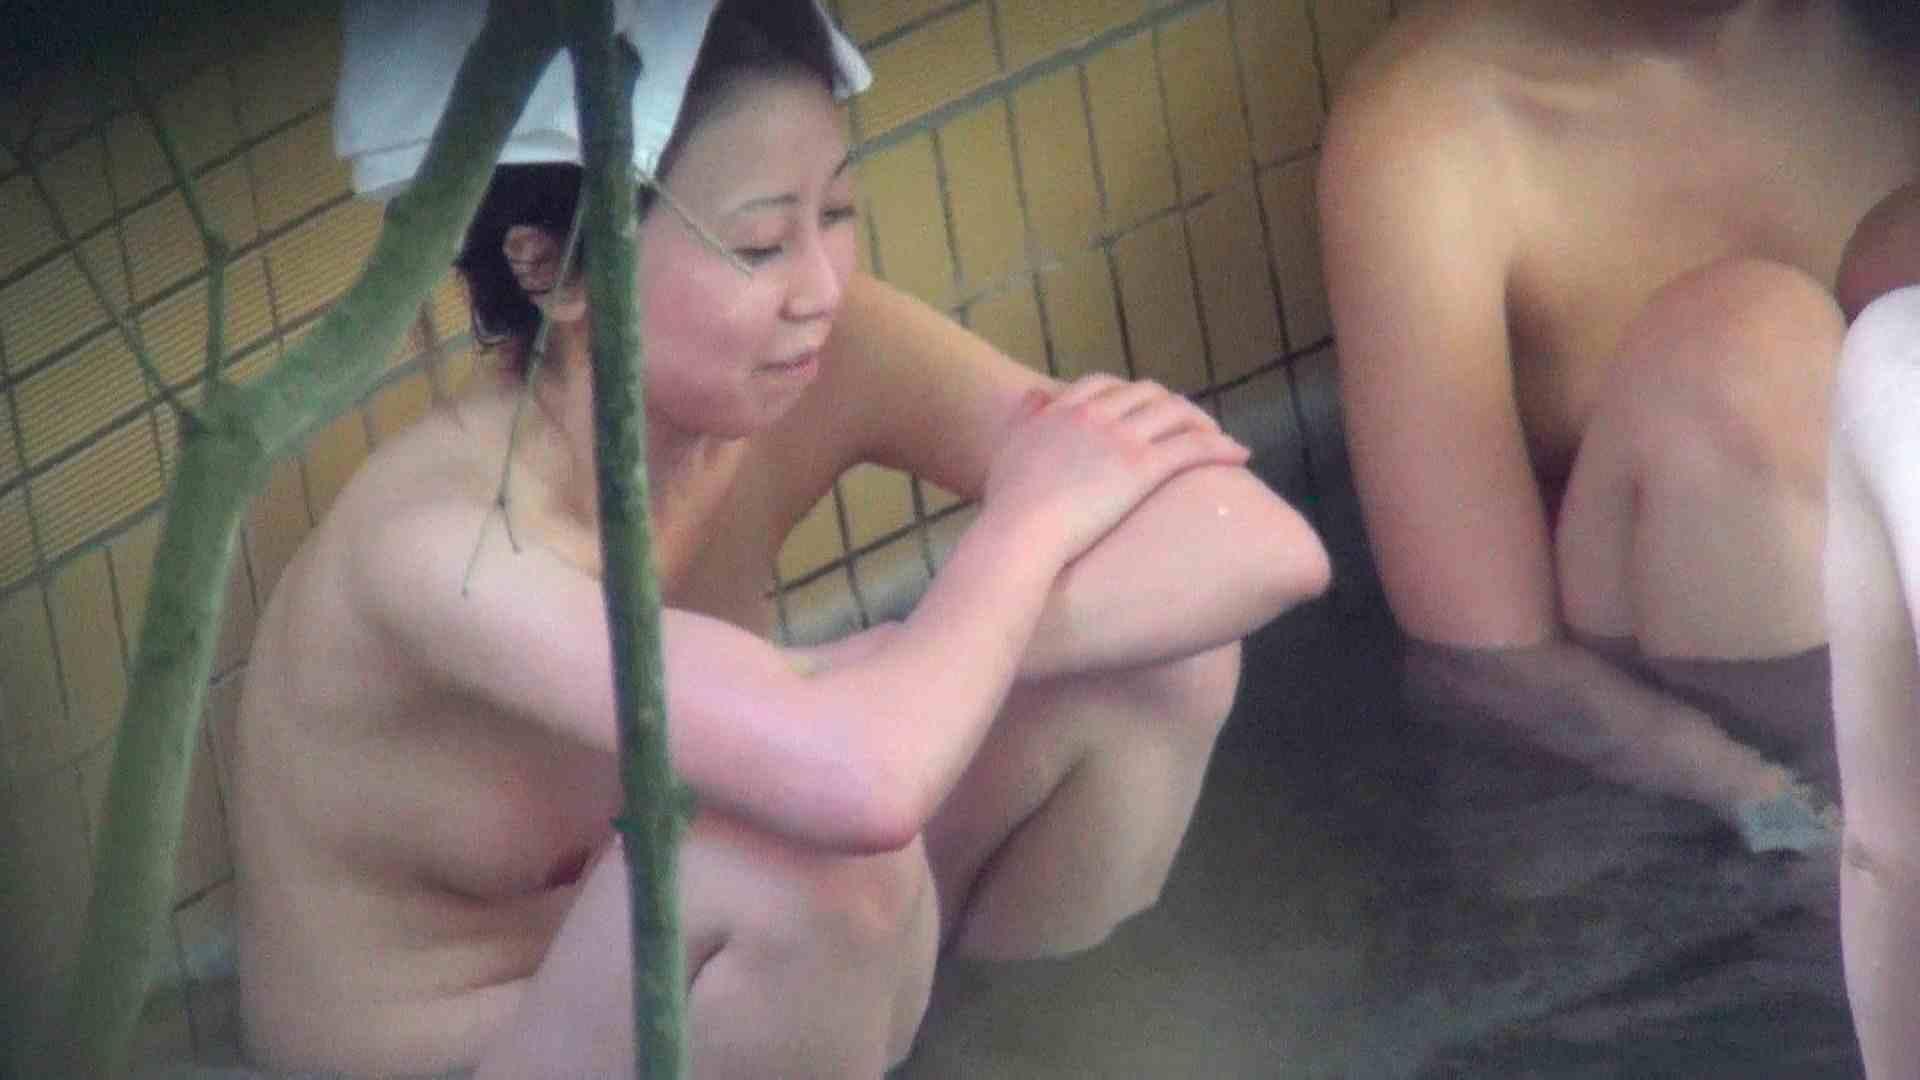 Vol.44 アラサー三人露天風呂女子会開催中 細身女性 ヌード画像 112画像 44